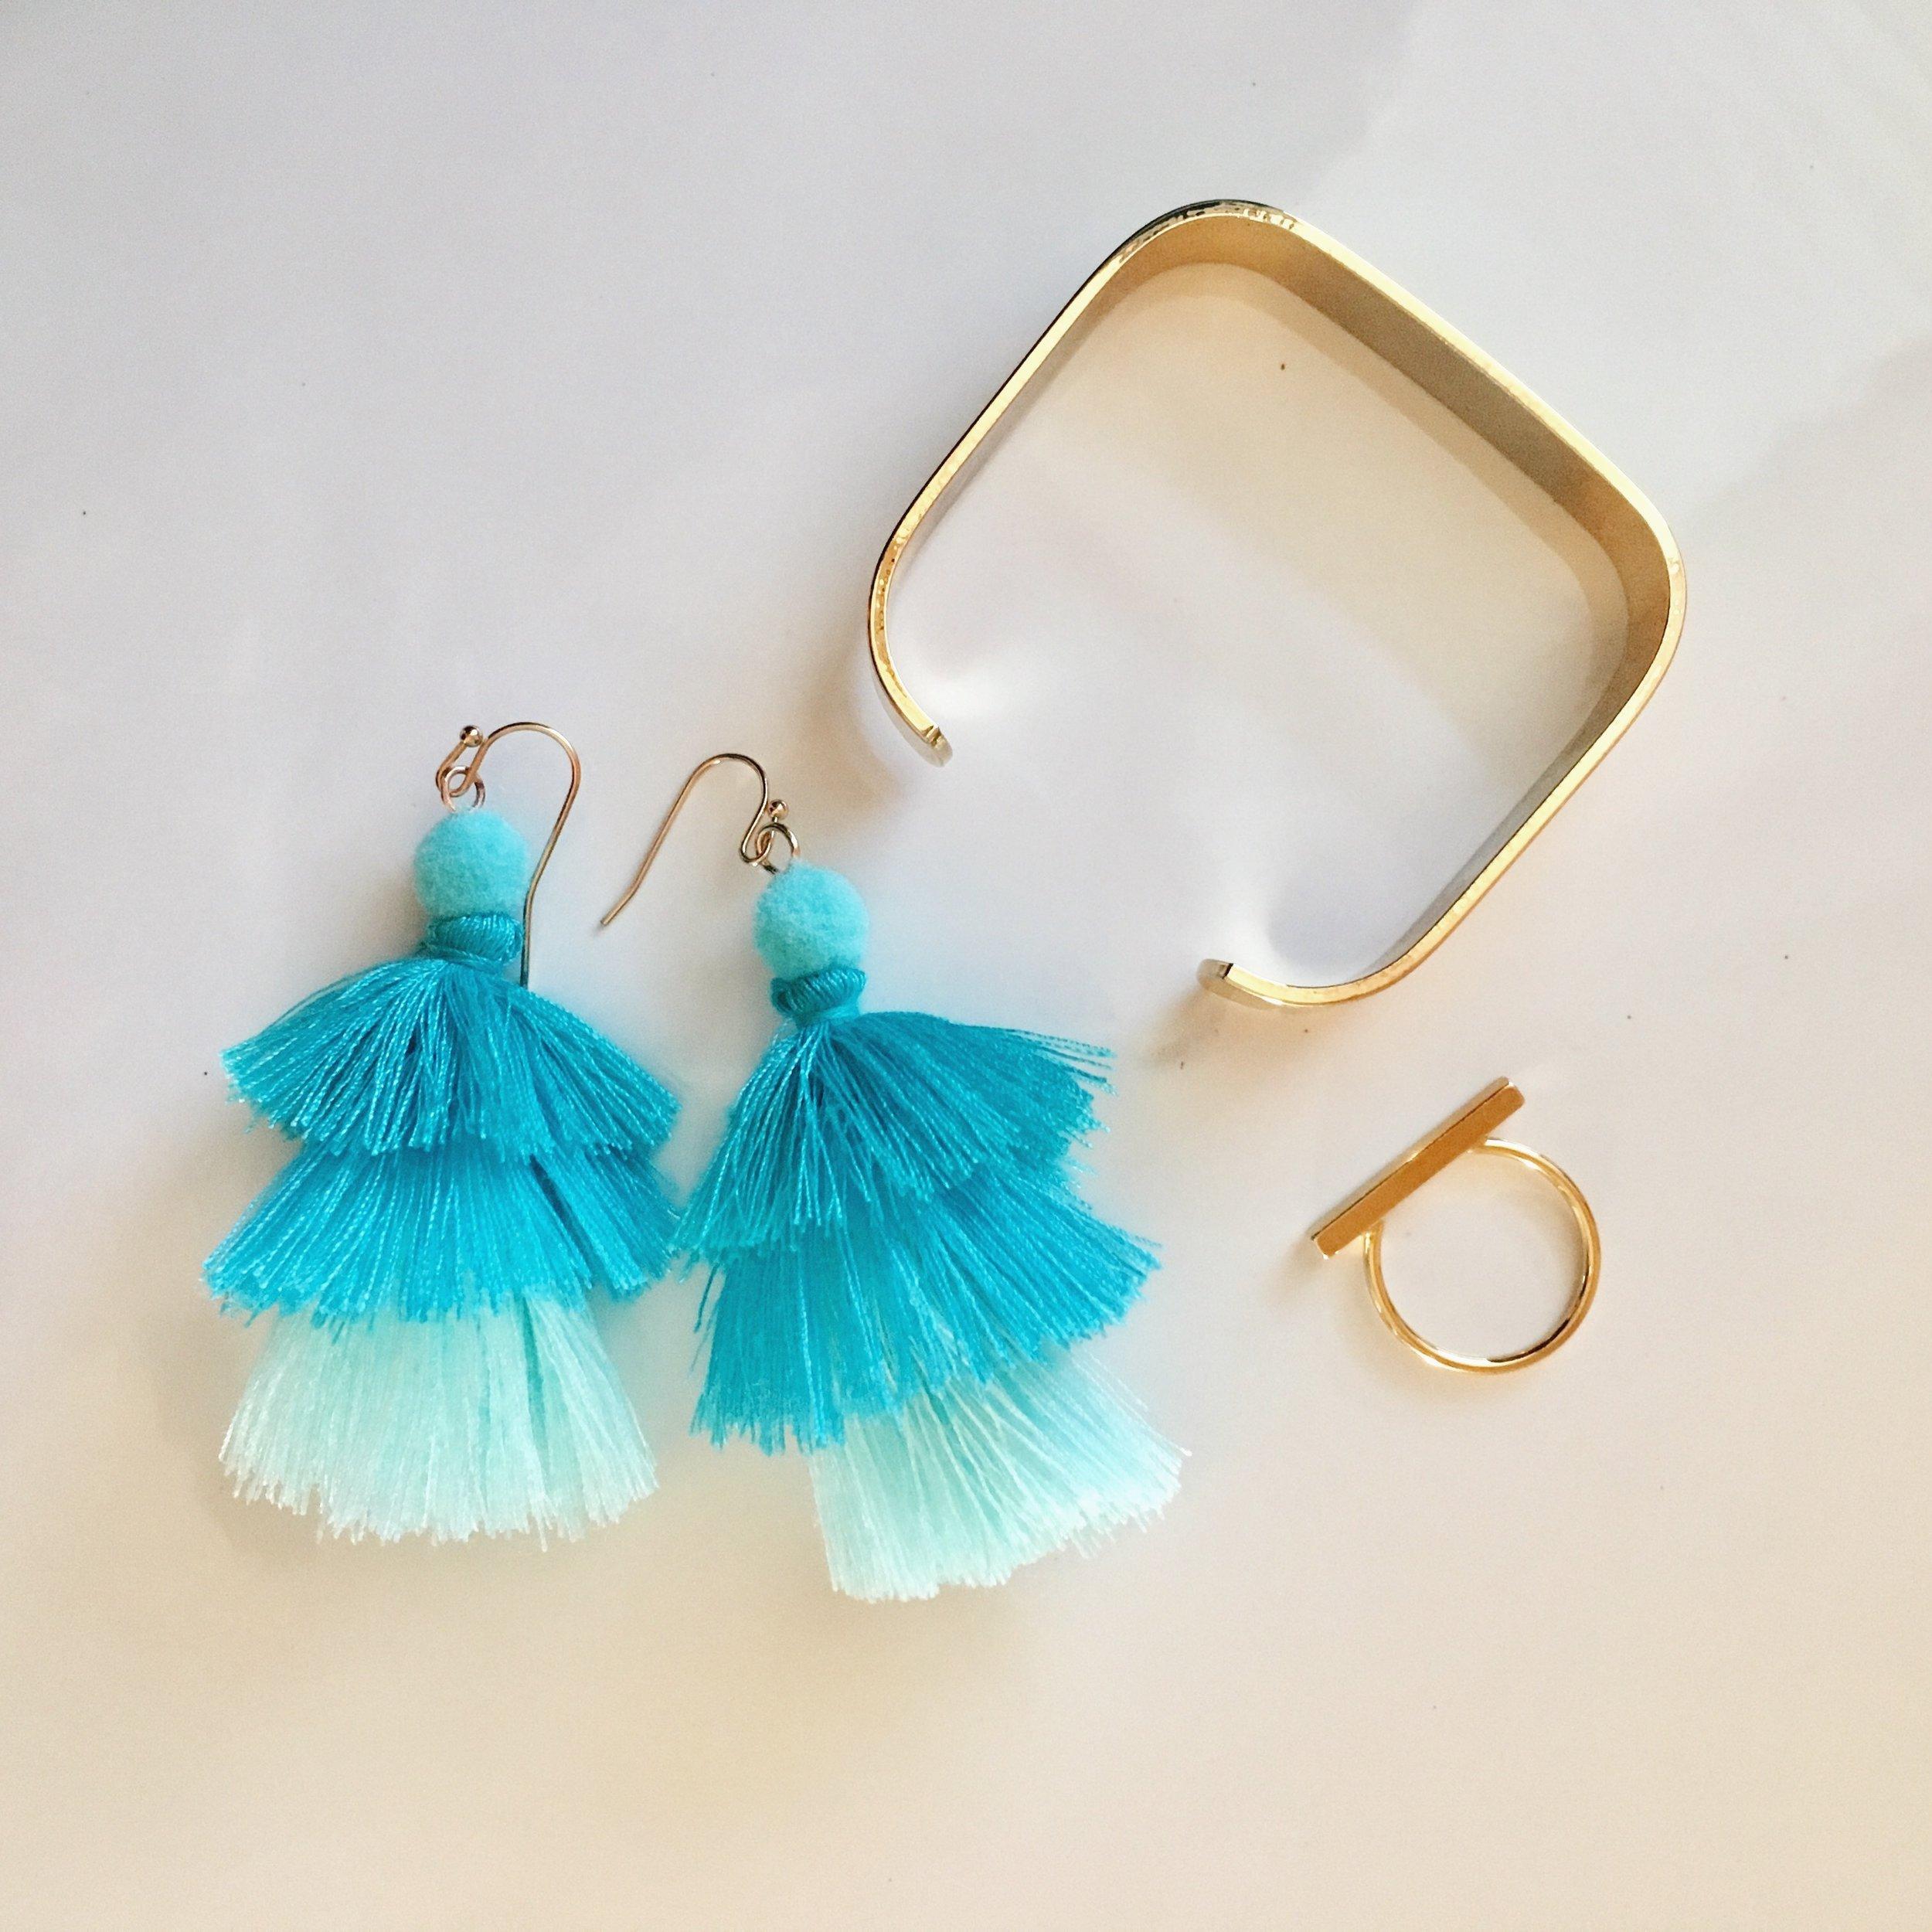 lark-and-love-jewelry-gold-ring-bracelet-tassel-drop-earring.jpg